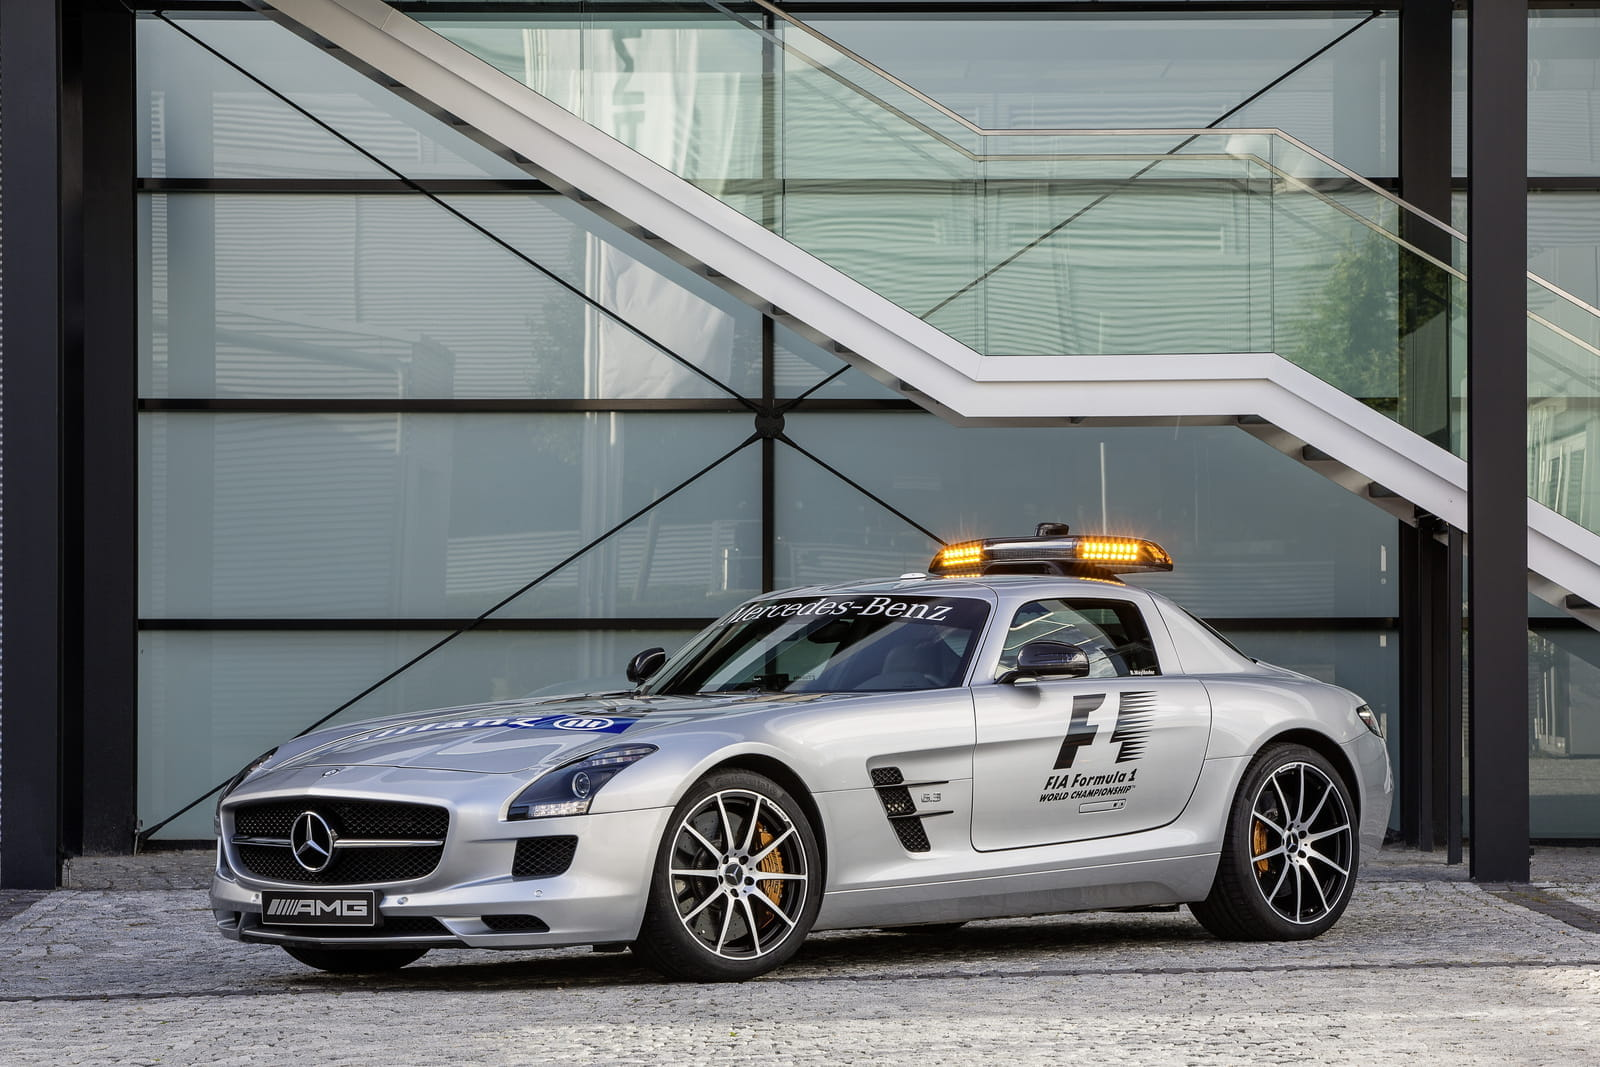 Mercedes Benz Sls Amg Gt Safety Car El Coche De Seguridad